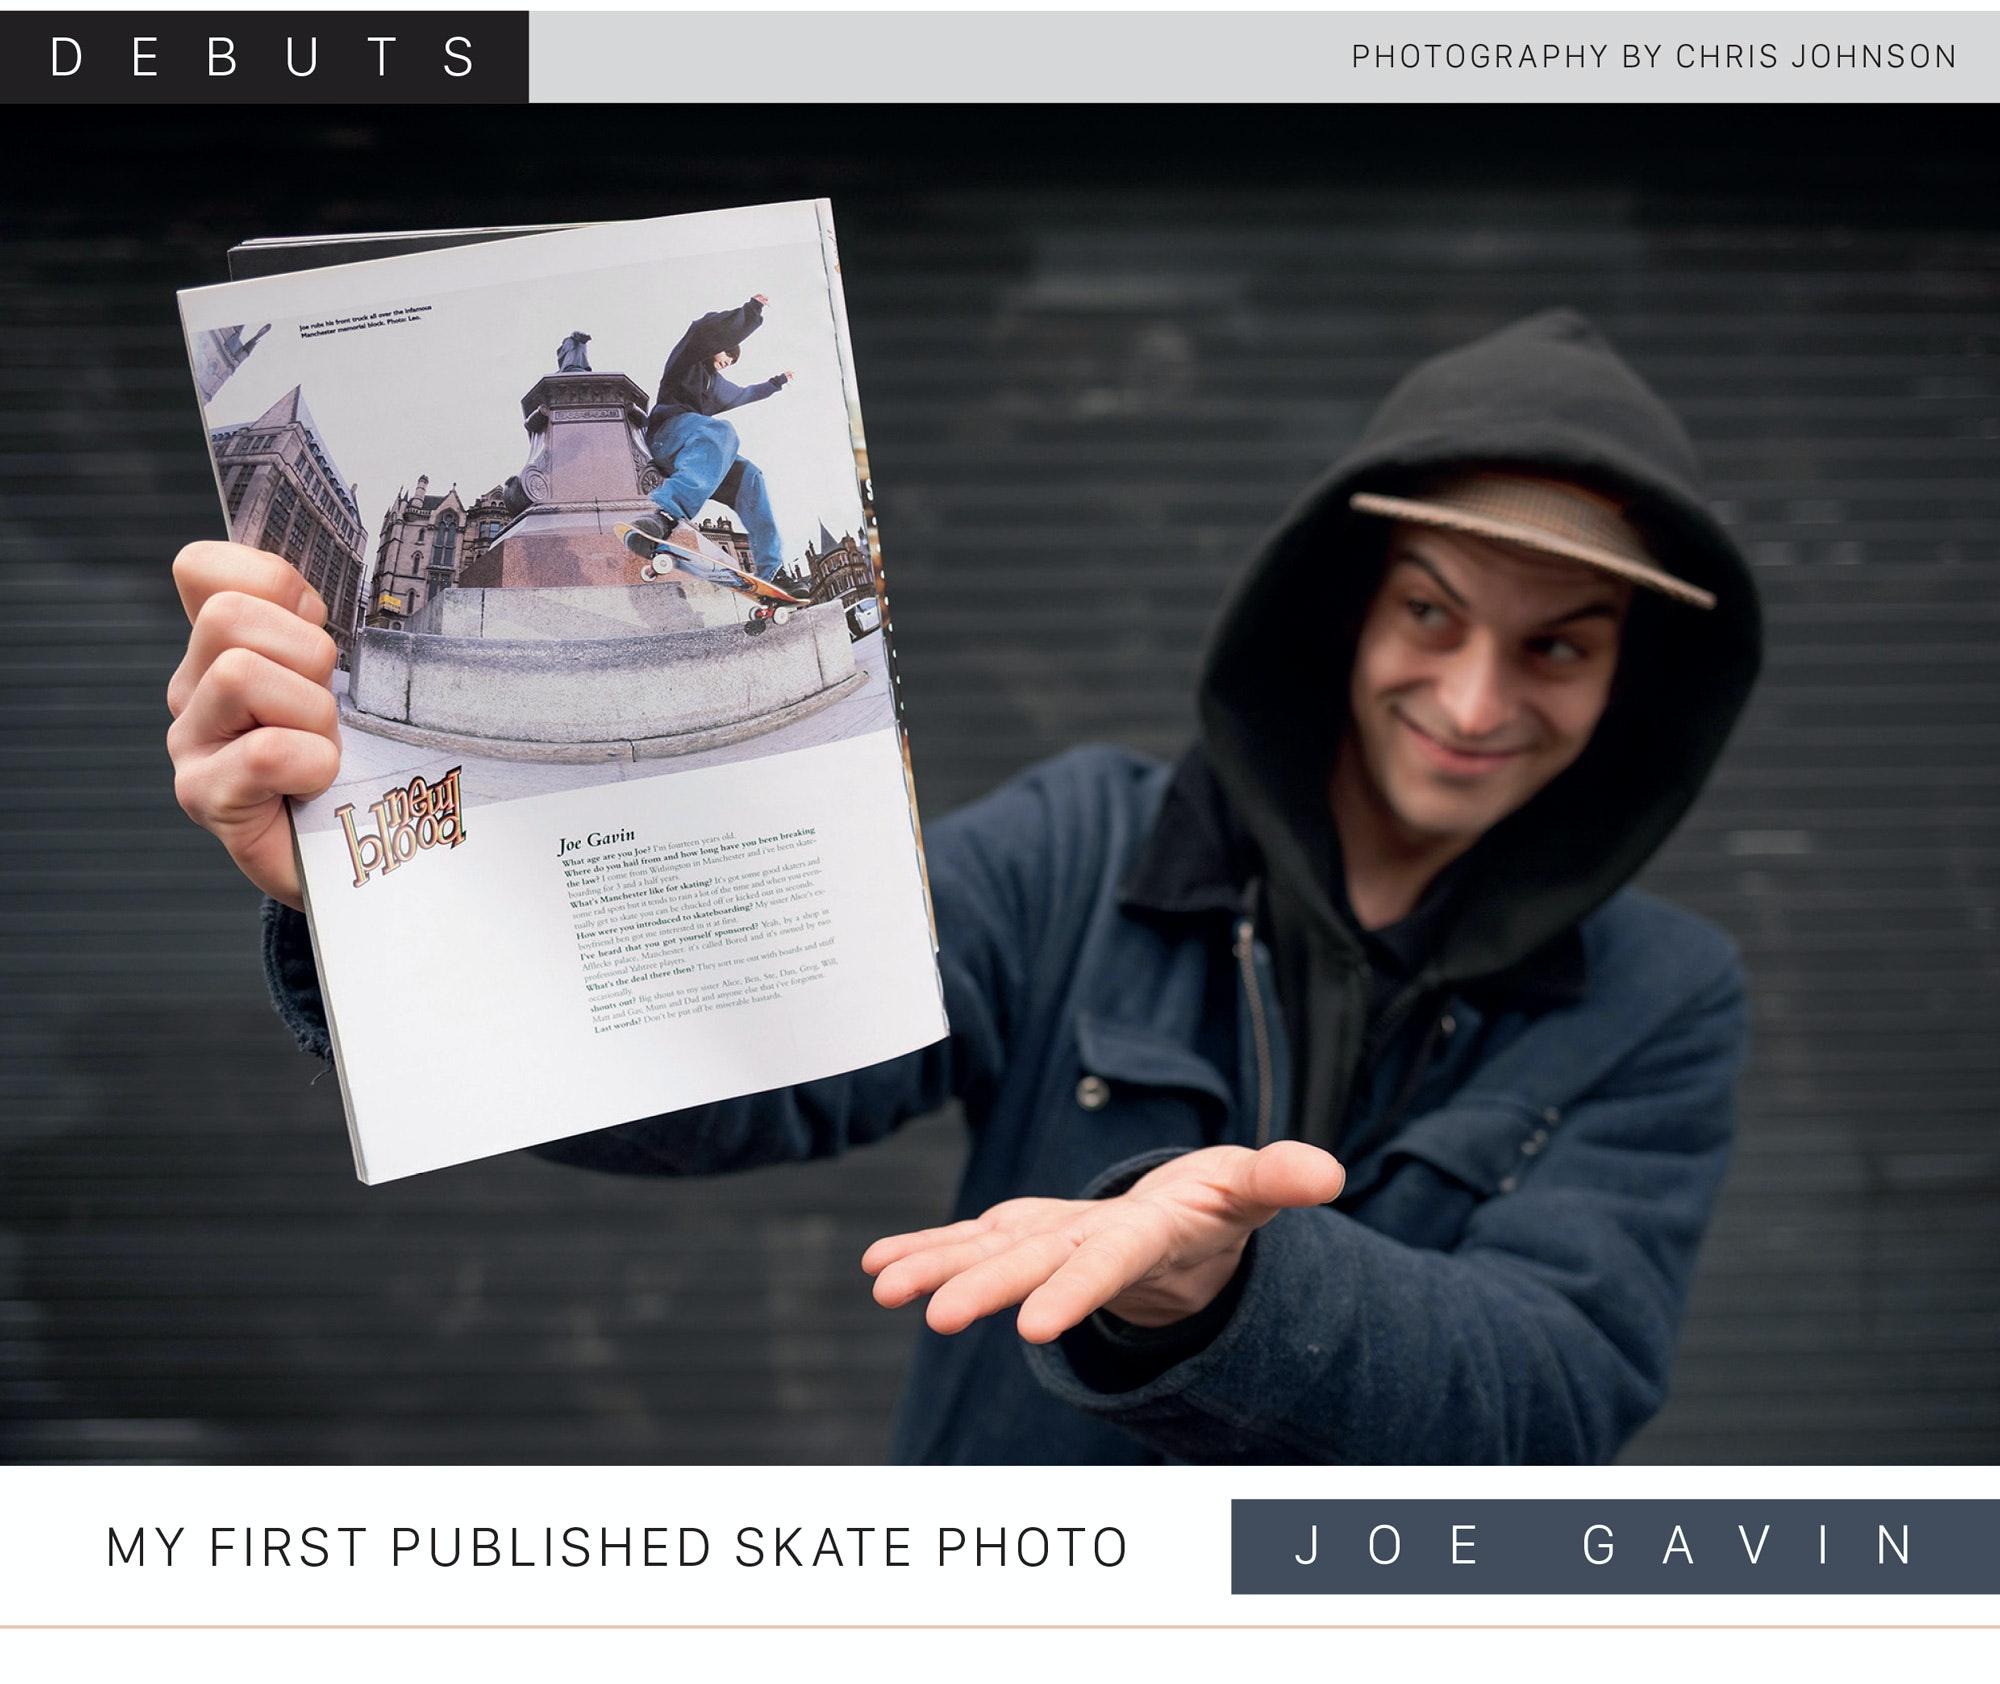 Debuts – Joe Gavin